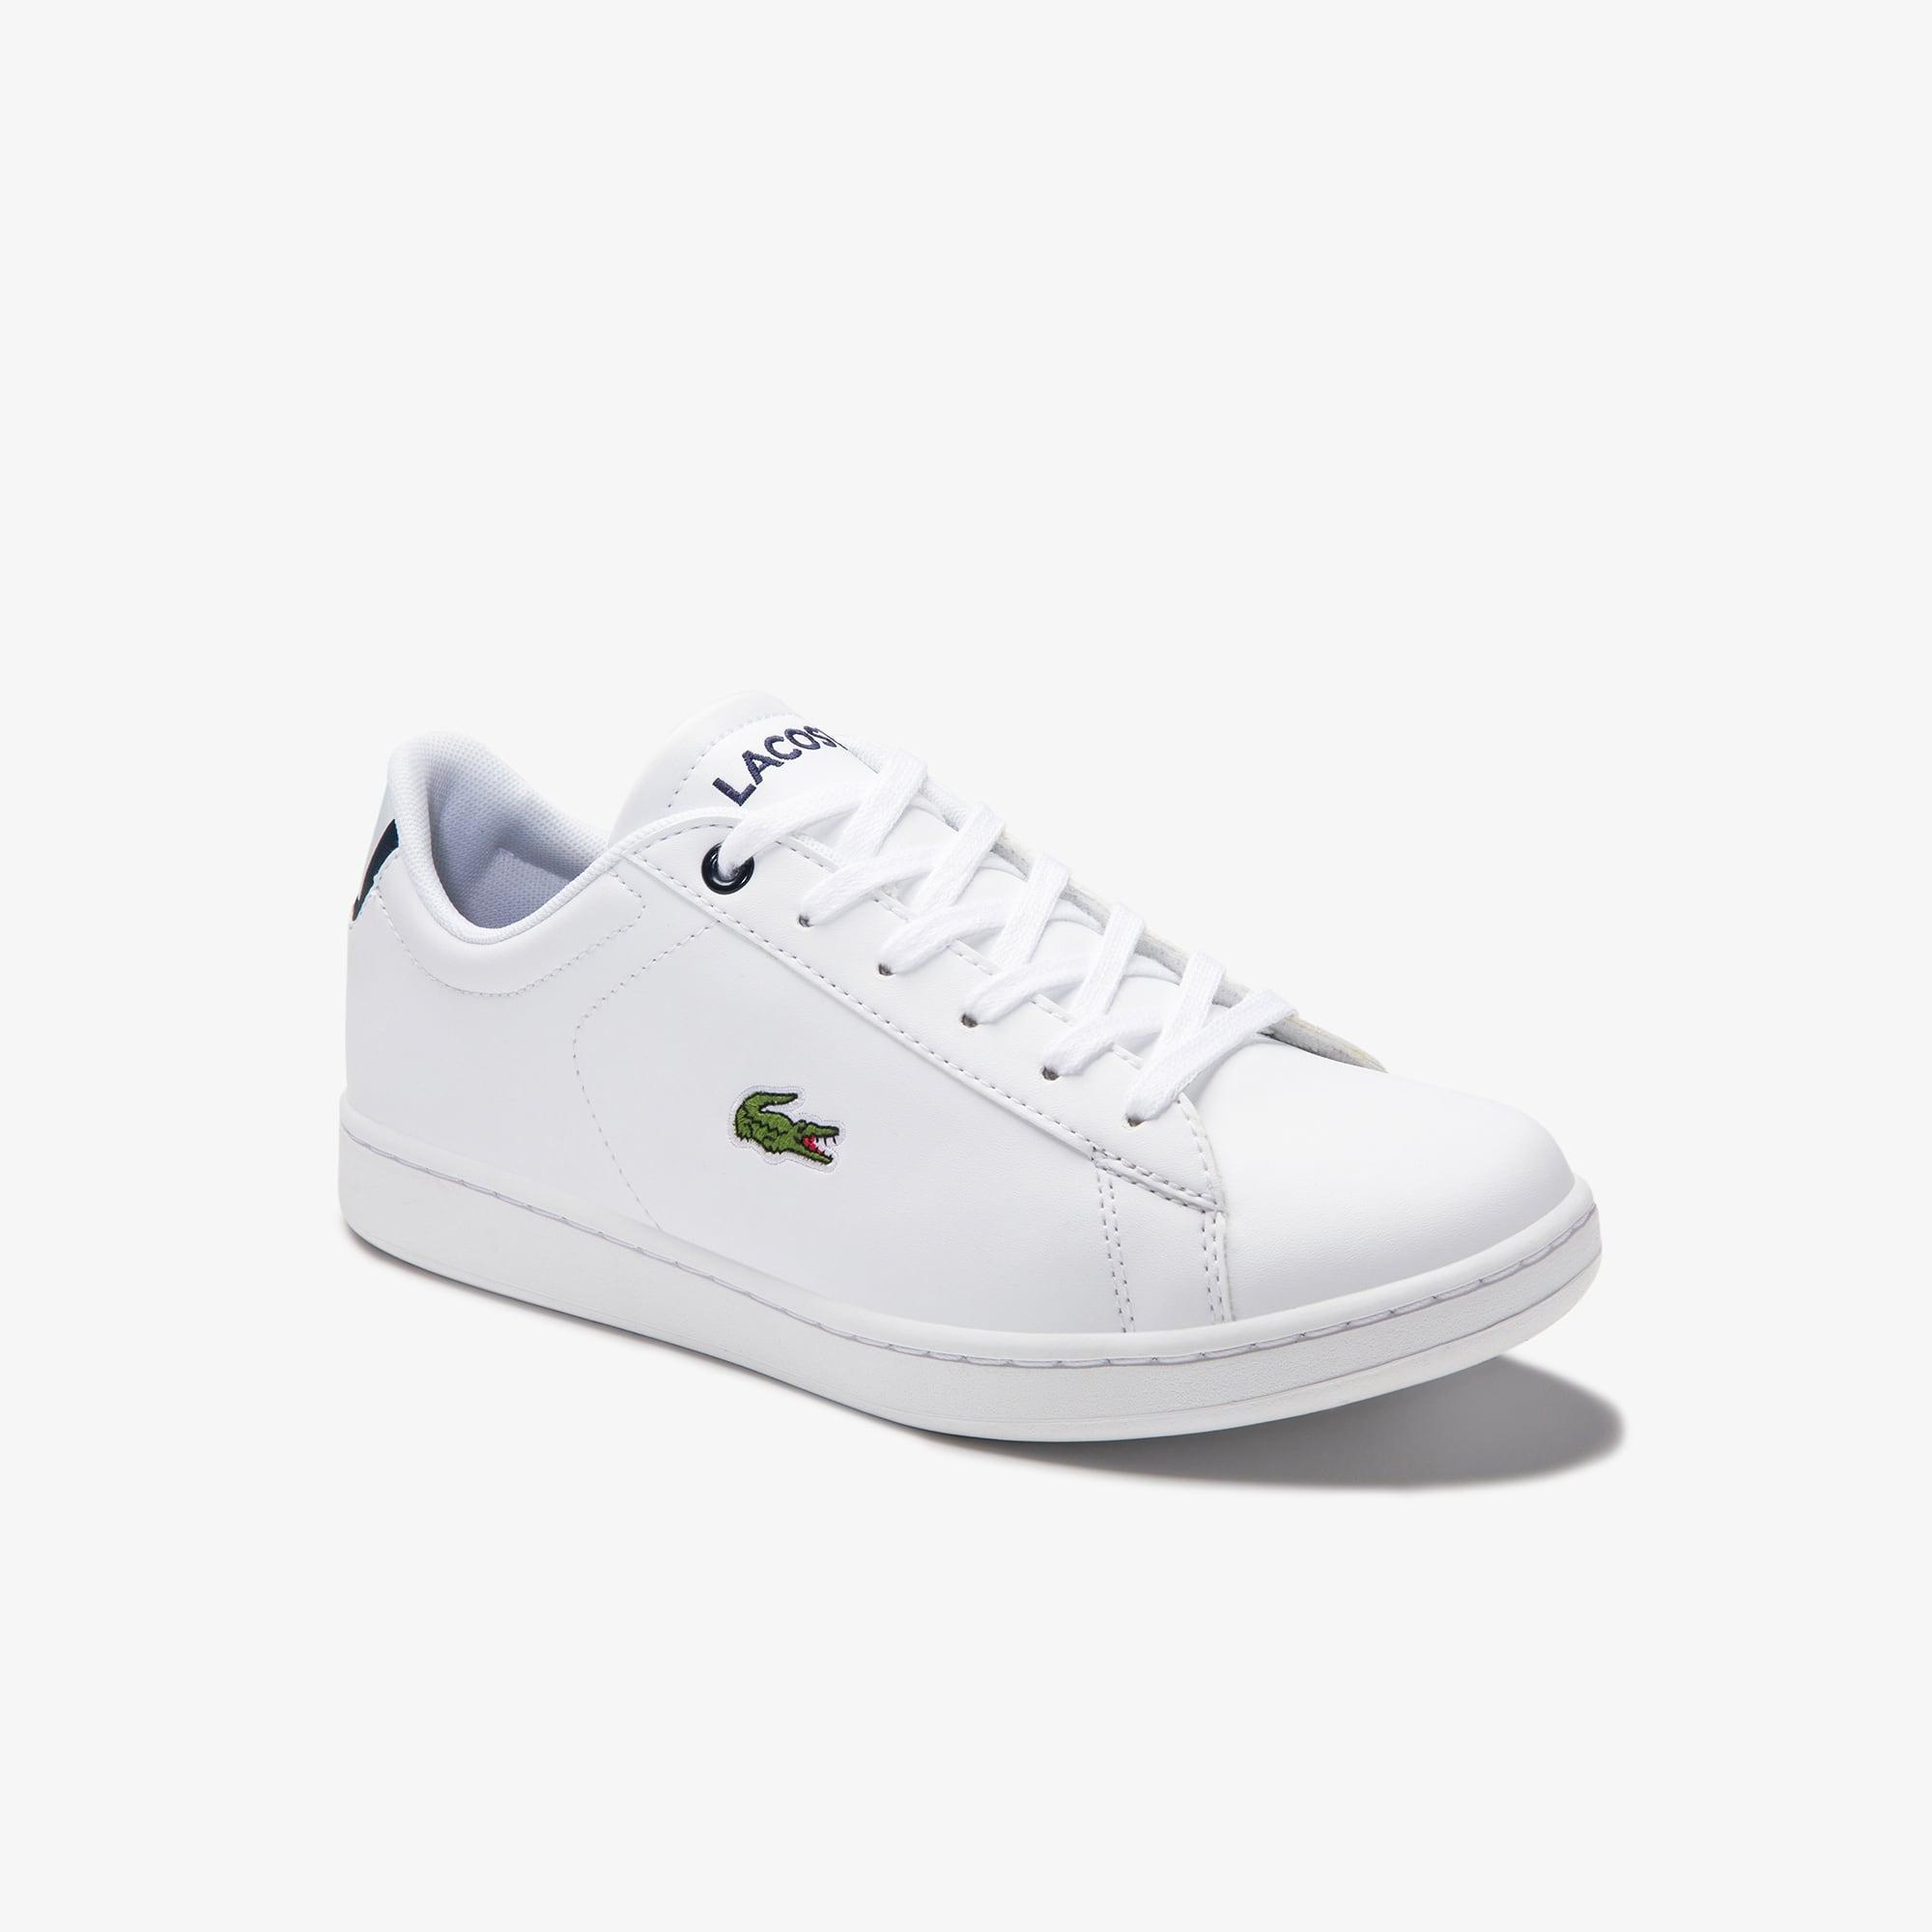 Lacoste Sneakers Carnaby Evo junior doublées ton sur ton en maille et synthétique Taille 39 Blanc/ma